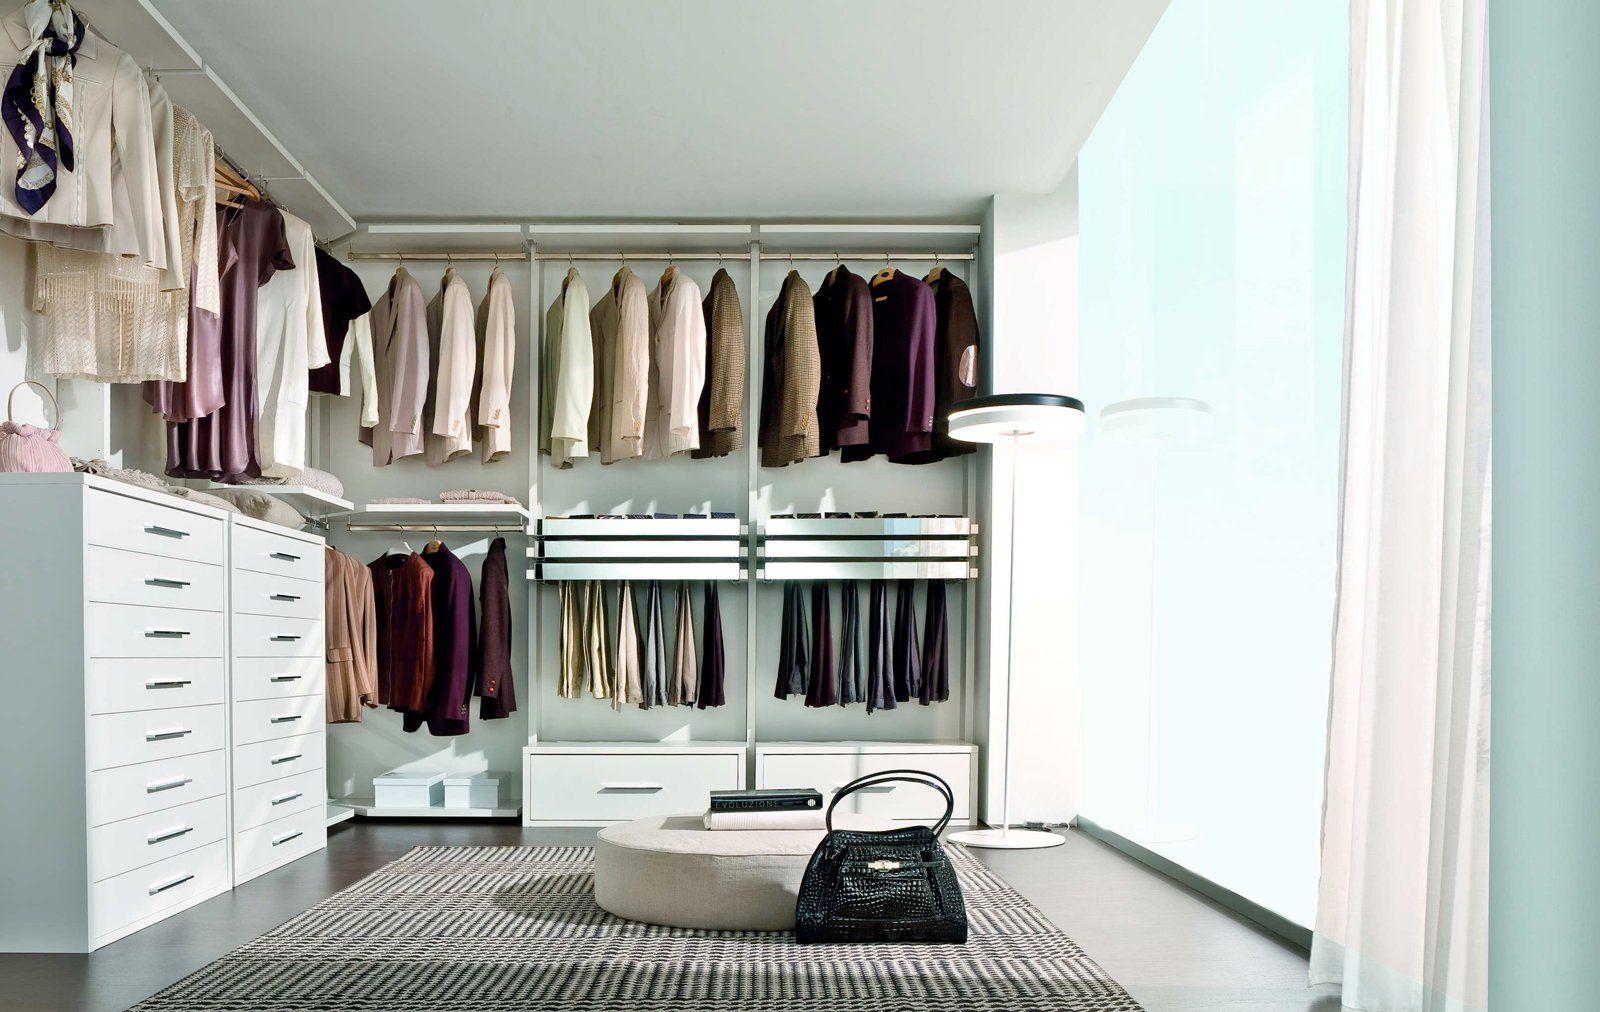 Cabina Armadio Per Hour : Cabine armadio soluzione trendy interiors and house